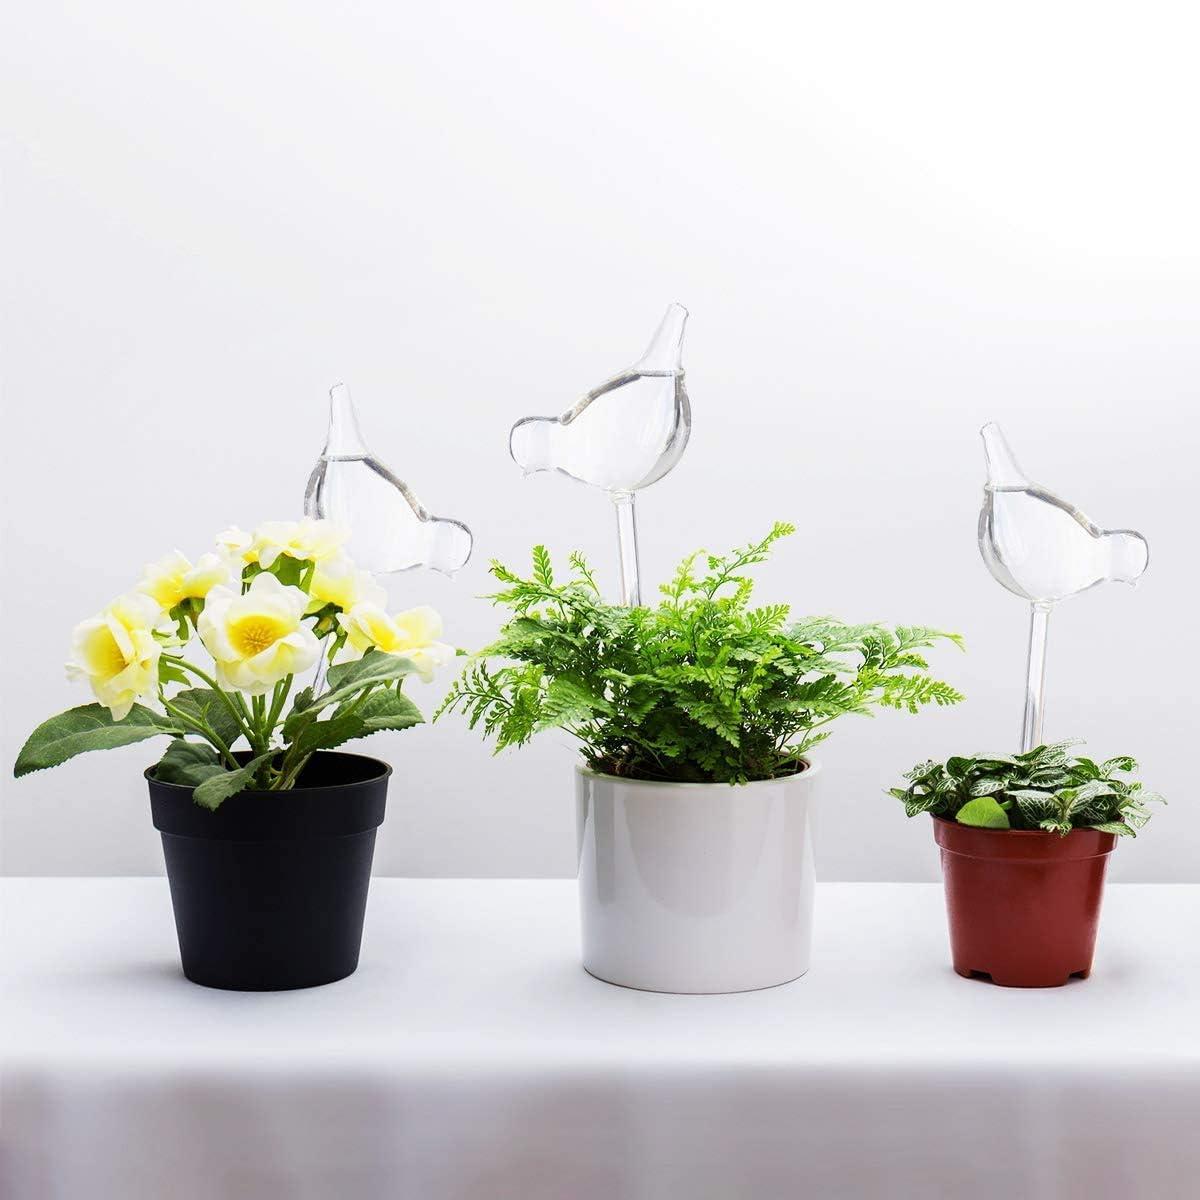 KnikGlass - Juego de 3 Bolas de Agua para Plantas, Forma de pájaro, soplado a Mano, Transparente, Mini Bombillas de Cristal Transparente